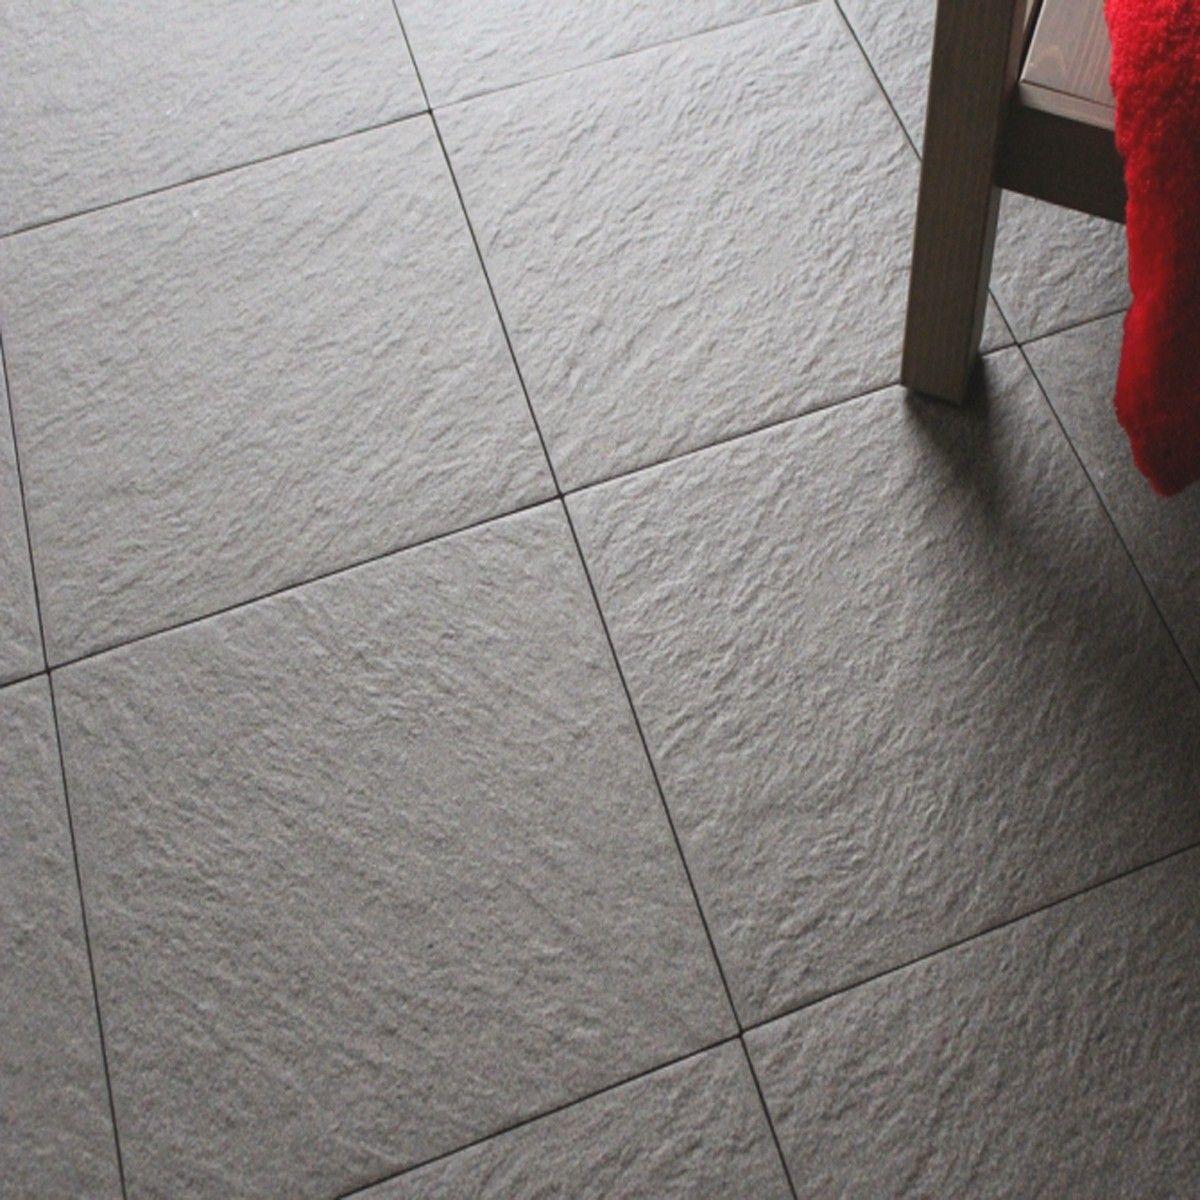 Magma antracite relief 300mm x 300mm anti slip floor tiles magma antracite relief 300mm x 300mm anti slip tile kitchen floorstiles dailygadgetfo Images